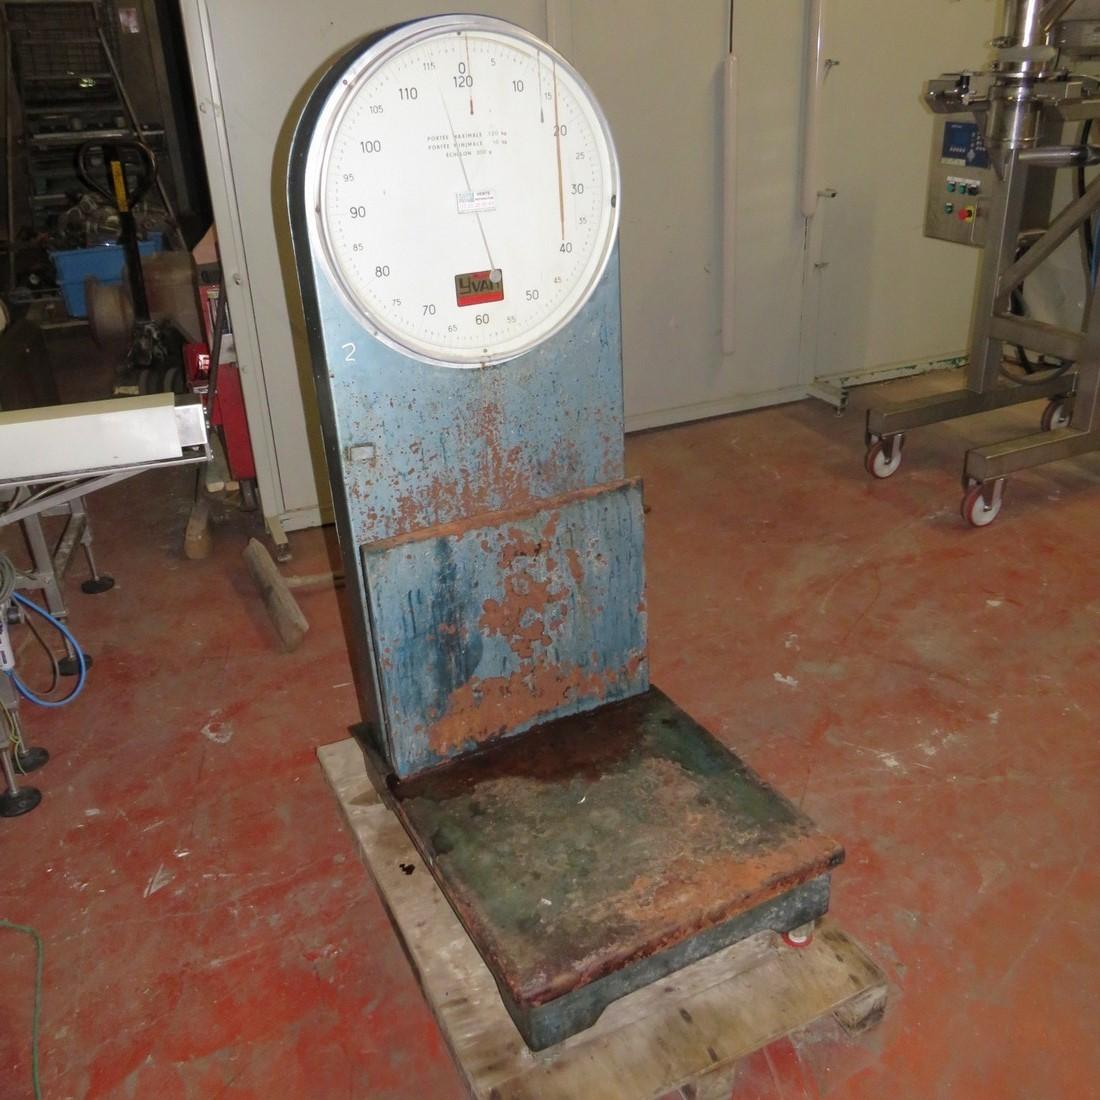 R14T916 YVAN weighing equipment